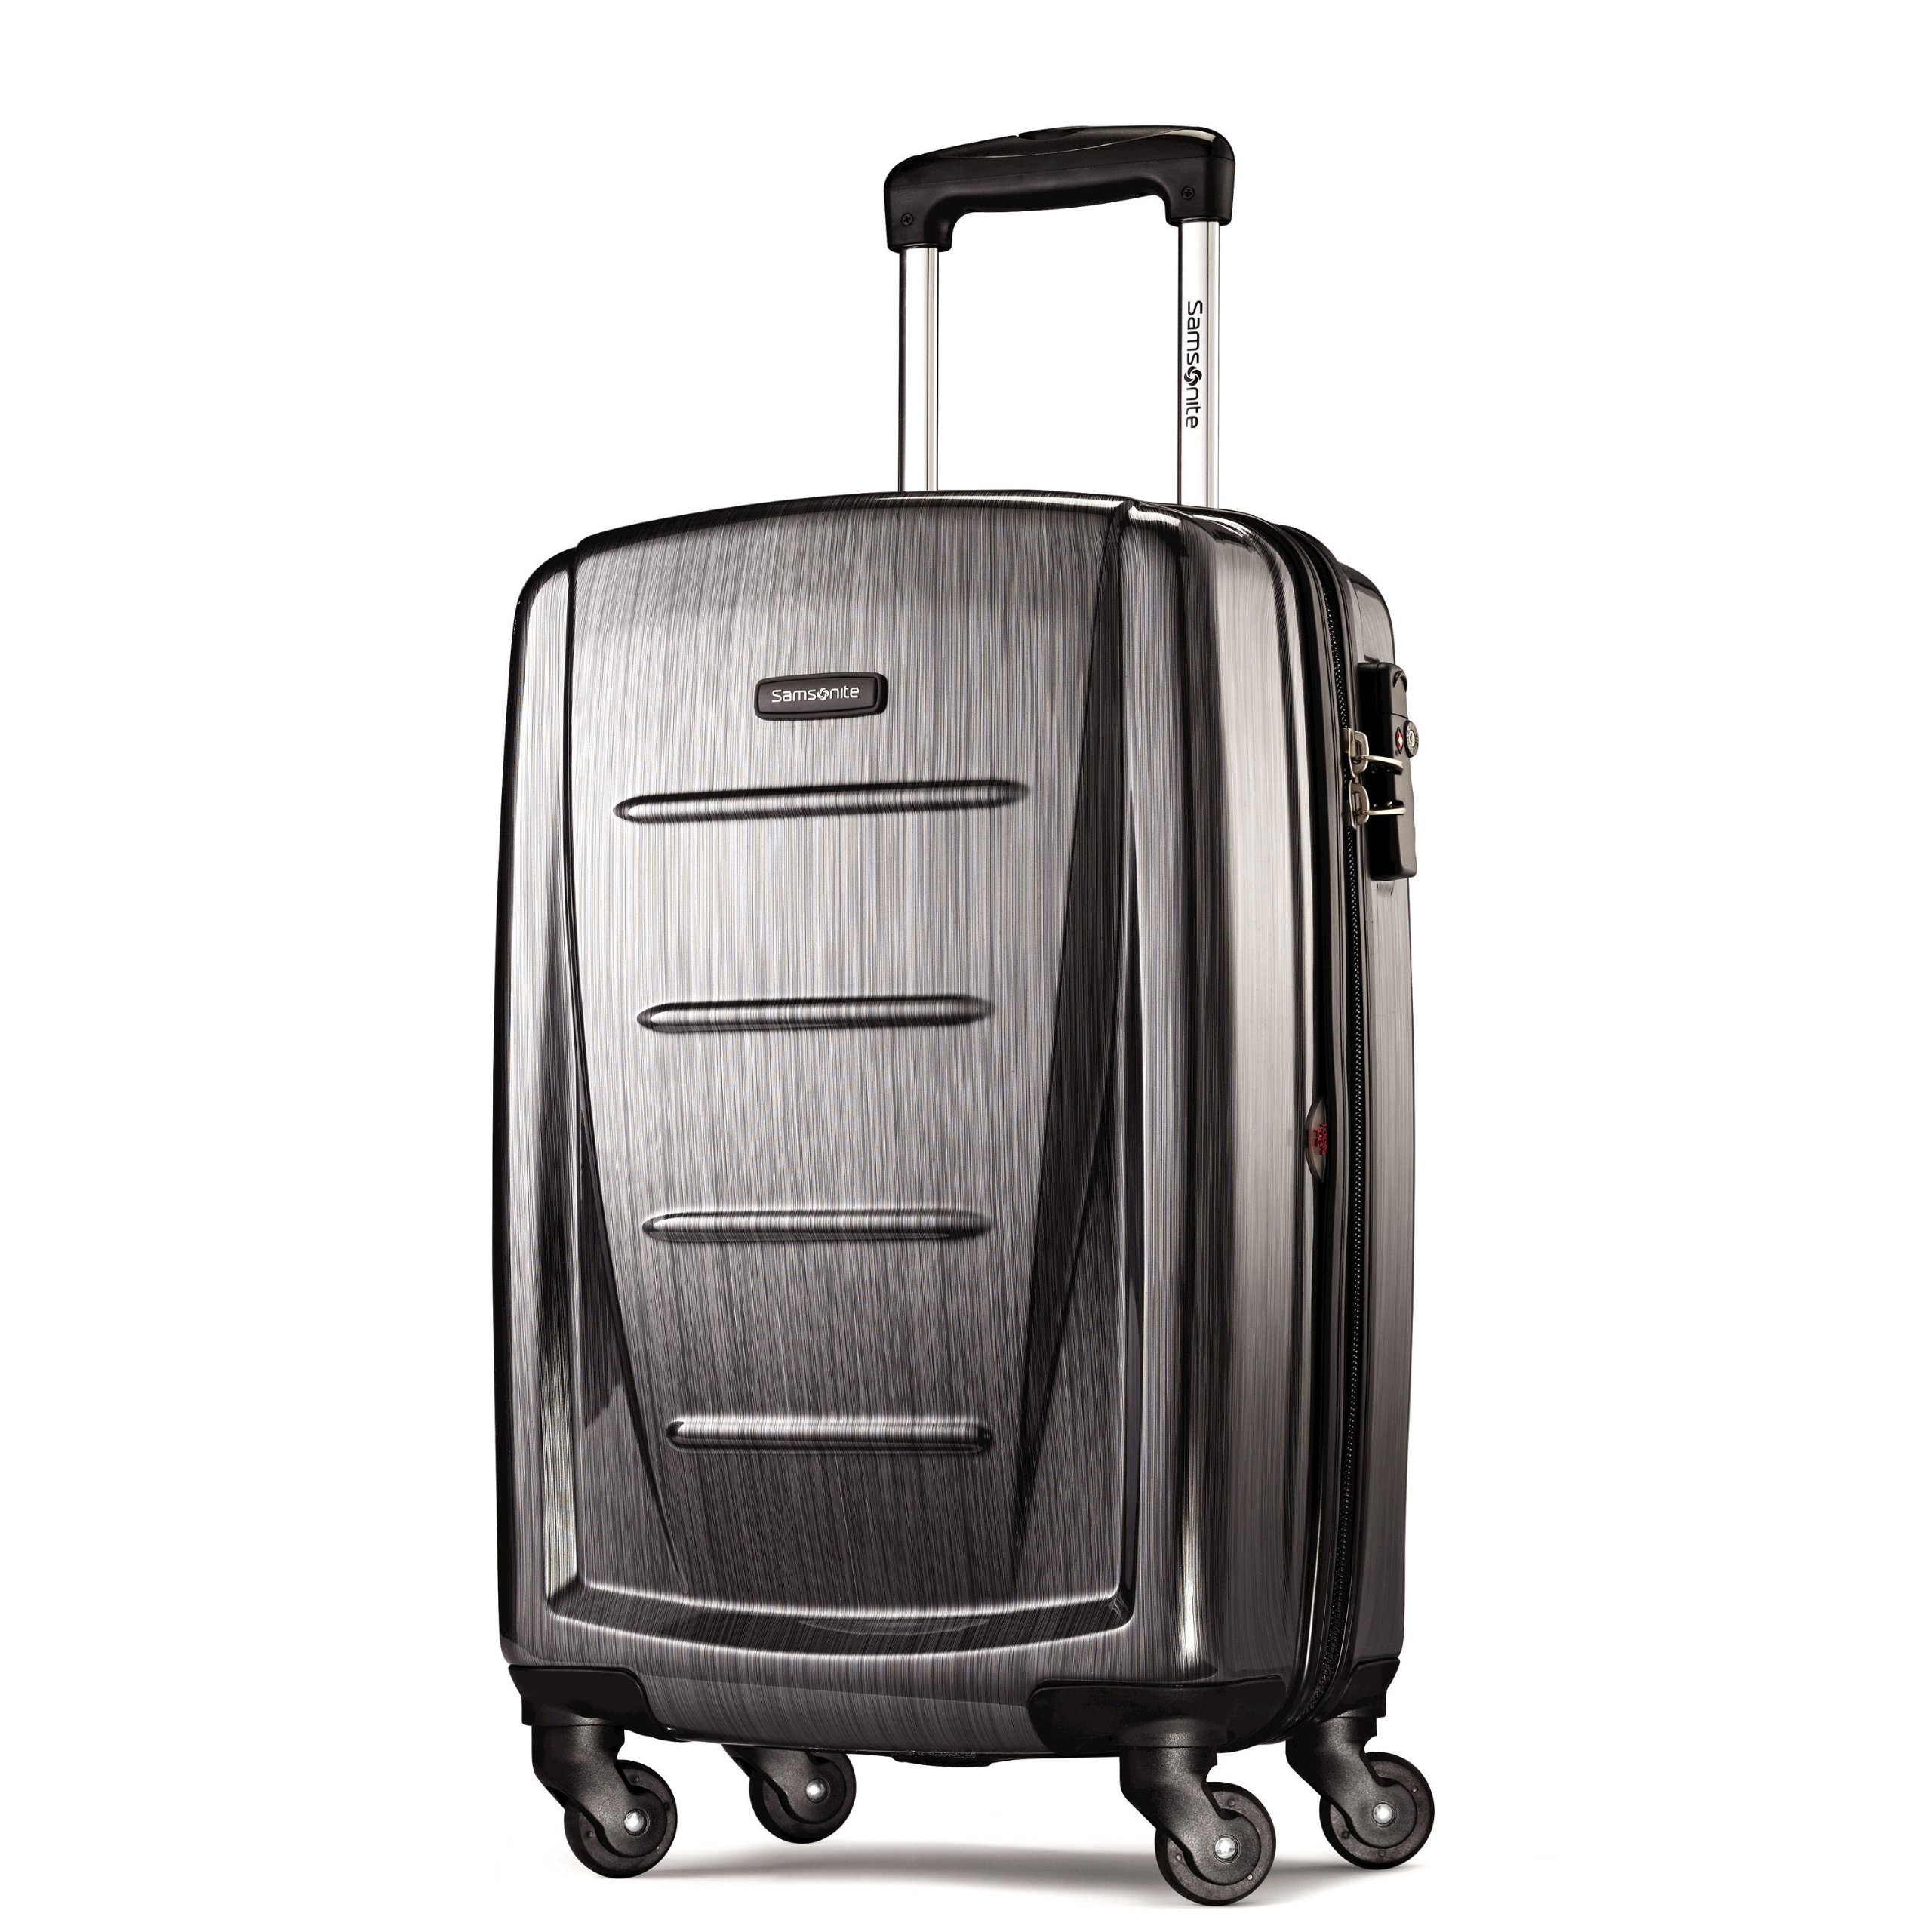 Samsonite Winfield 2 Hardside 20'' Luggage, Charcoal